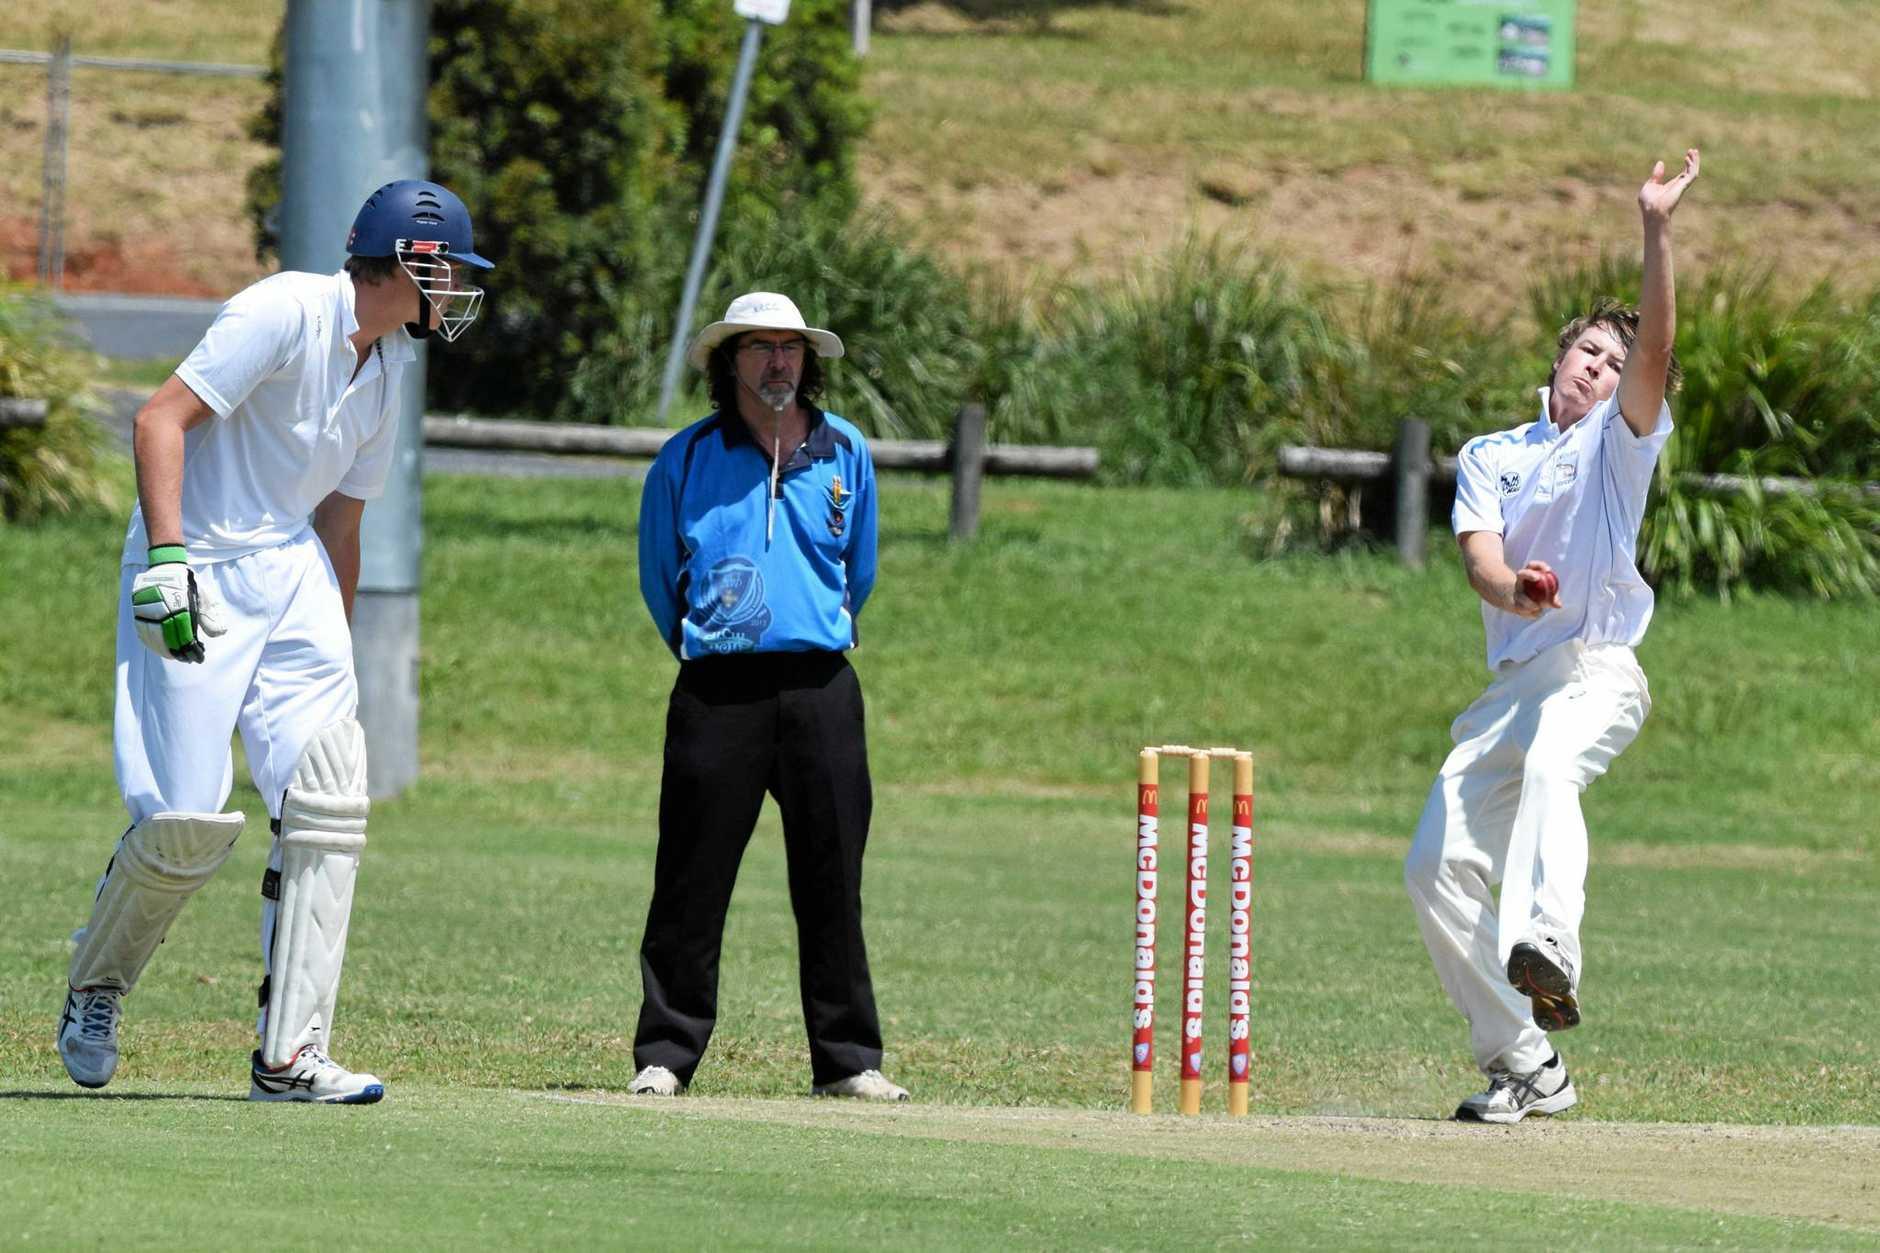 QUICK WEAPON: Nana Glen bowler Josh Bartlett on his way to a second innings five-wicket haul against Dorrigo last week.